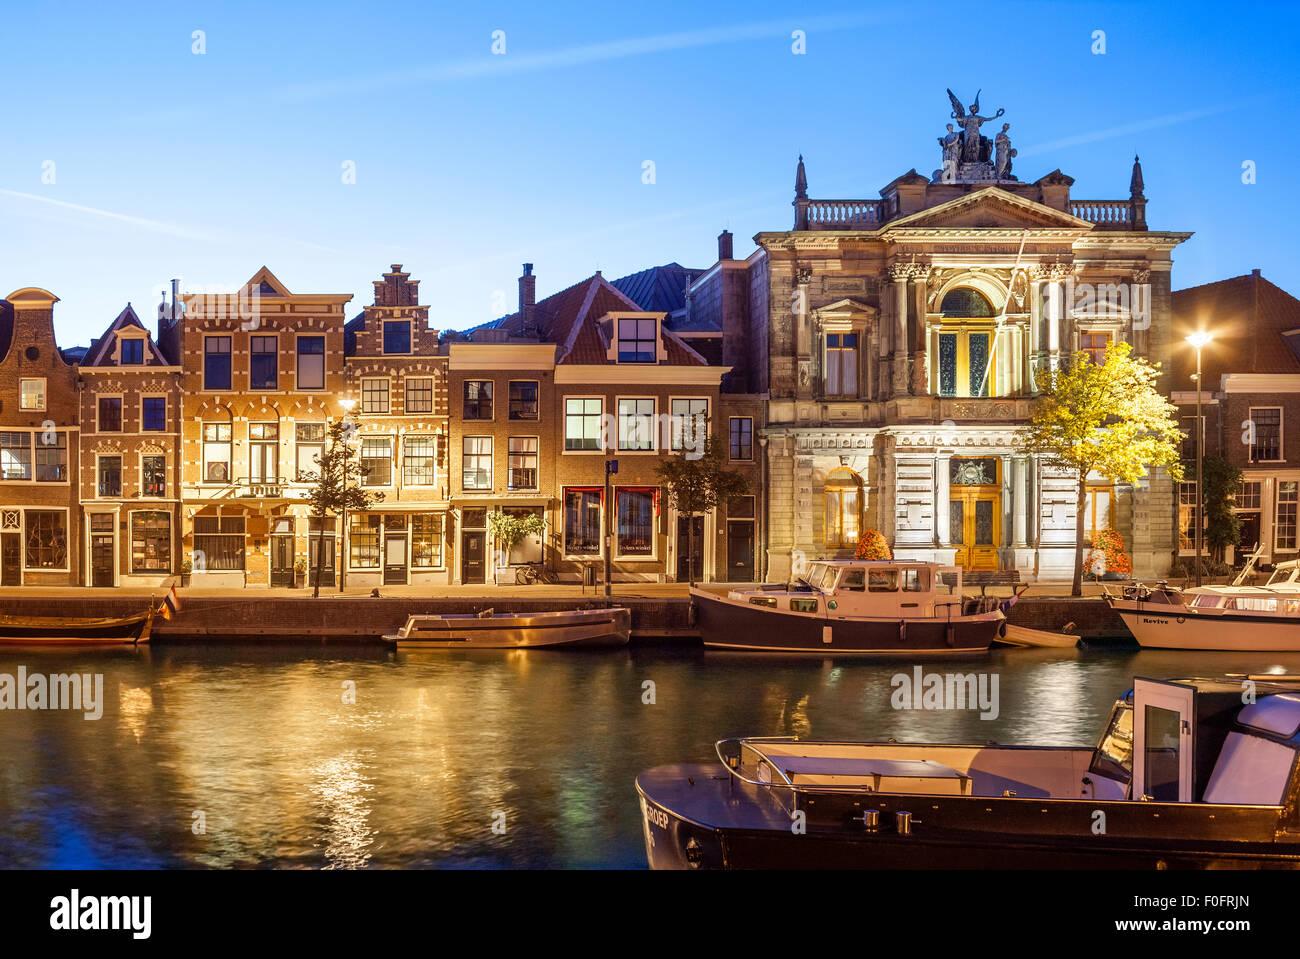 http://c7.alamy.com/comp/F0FRJN/haarlem-teylers-museum-and-spaarne-river-F0FRJN.jpg